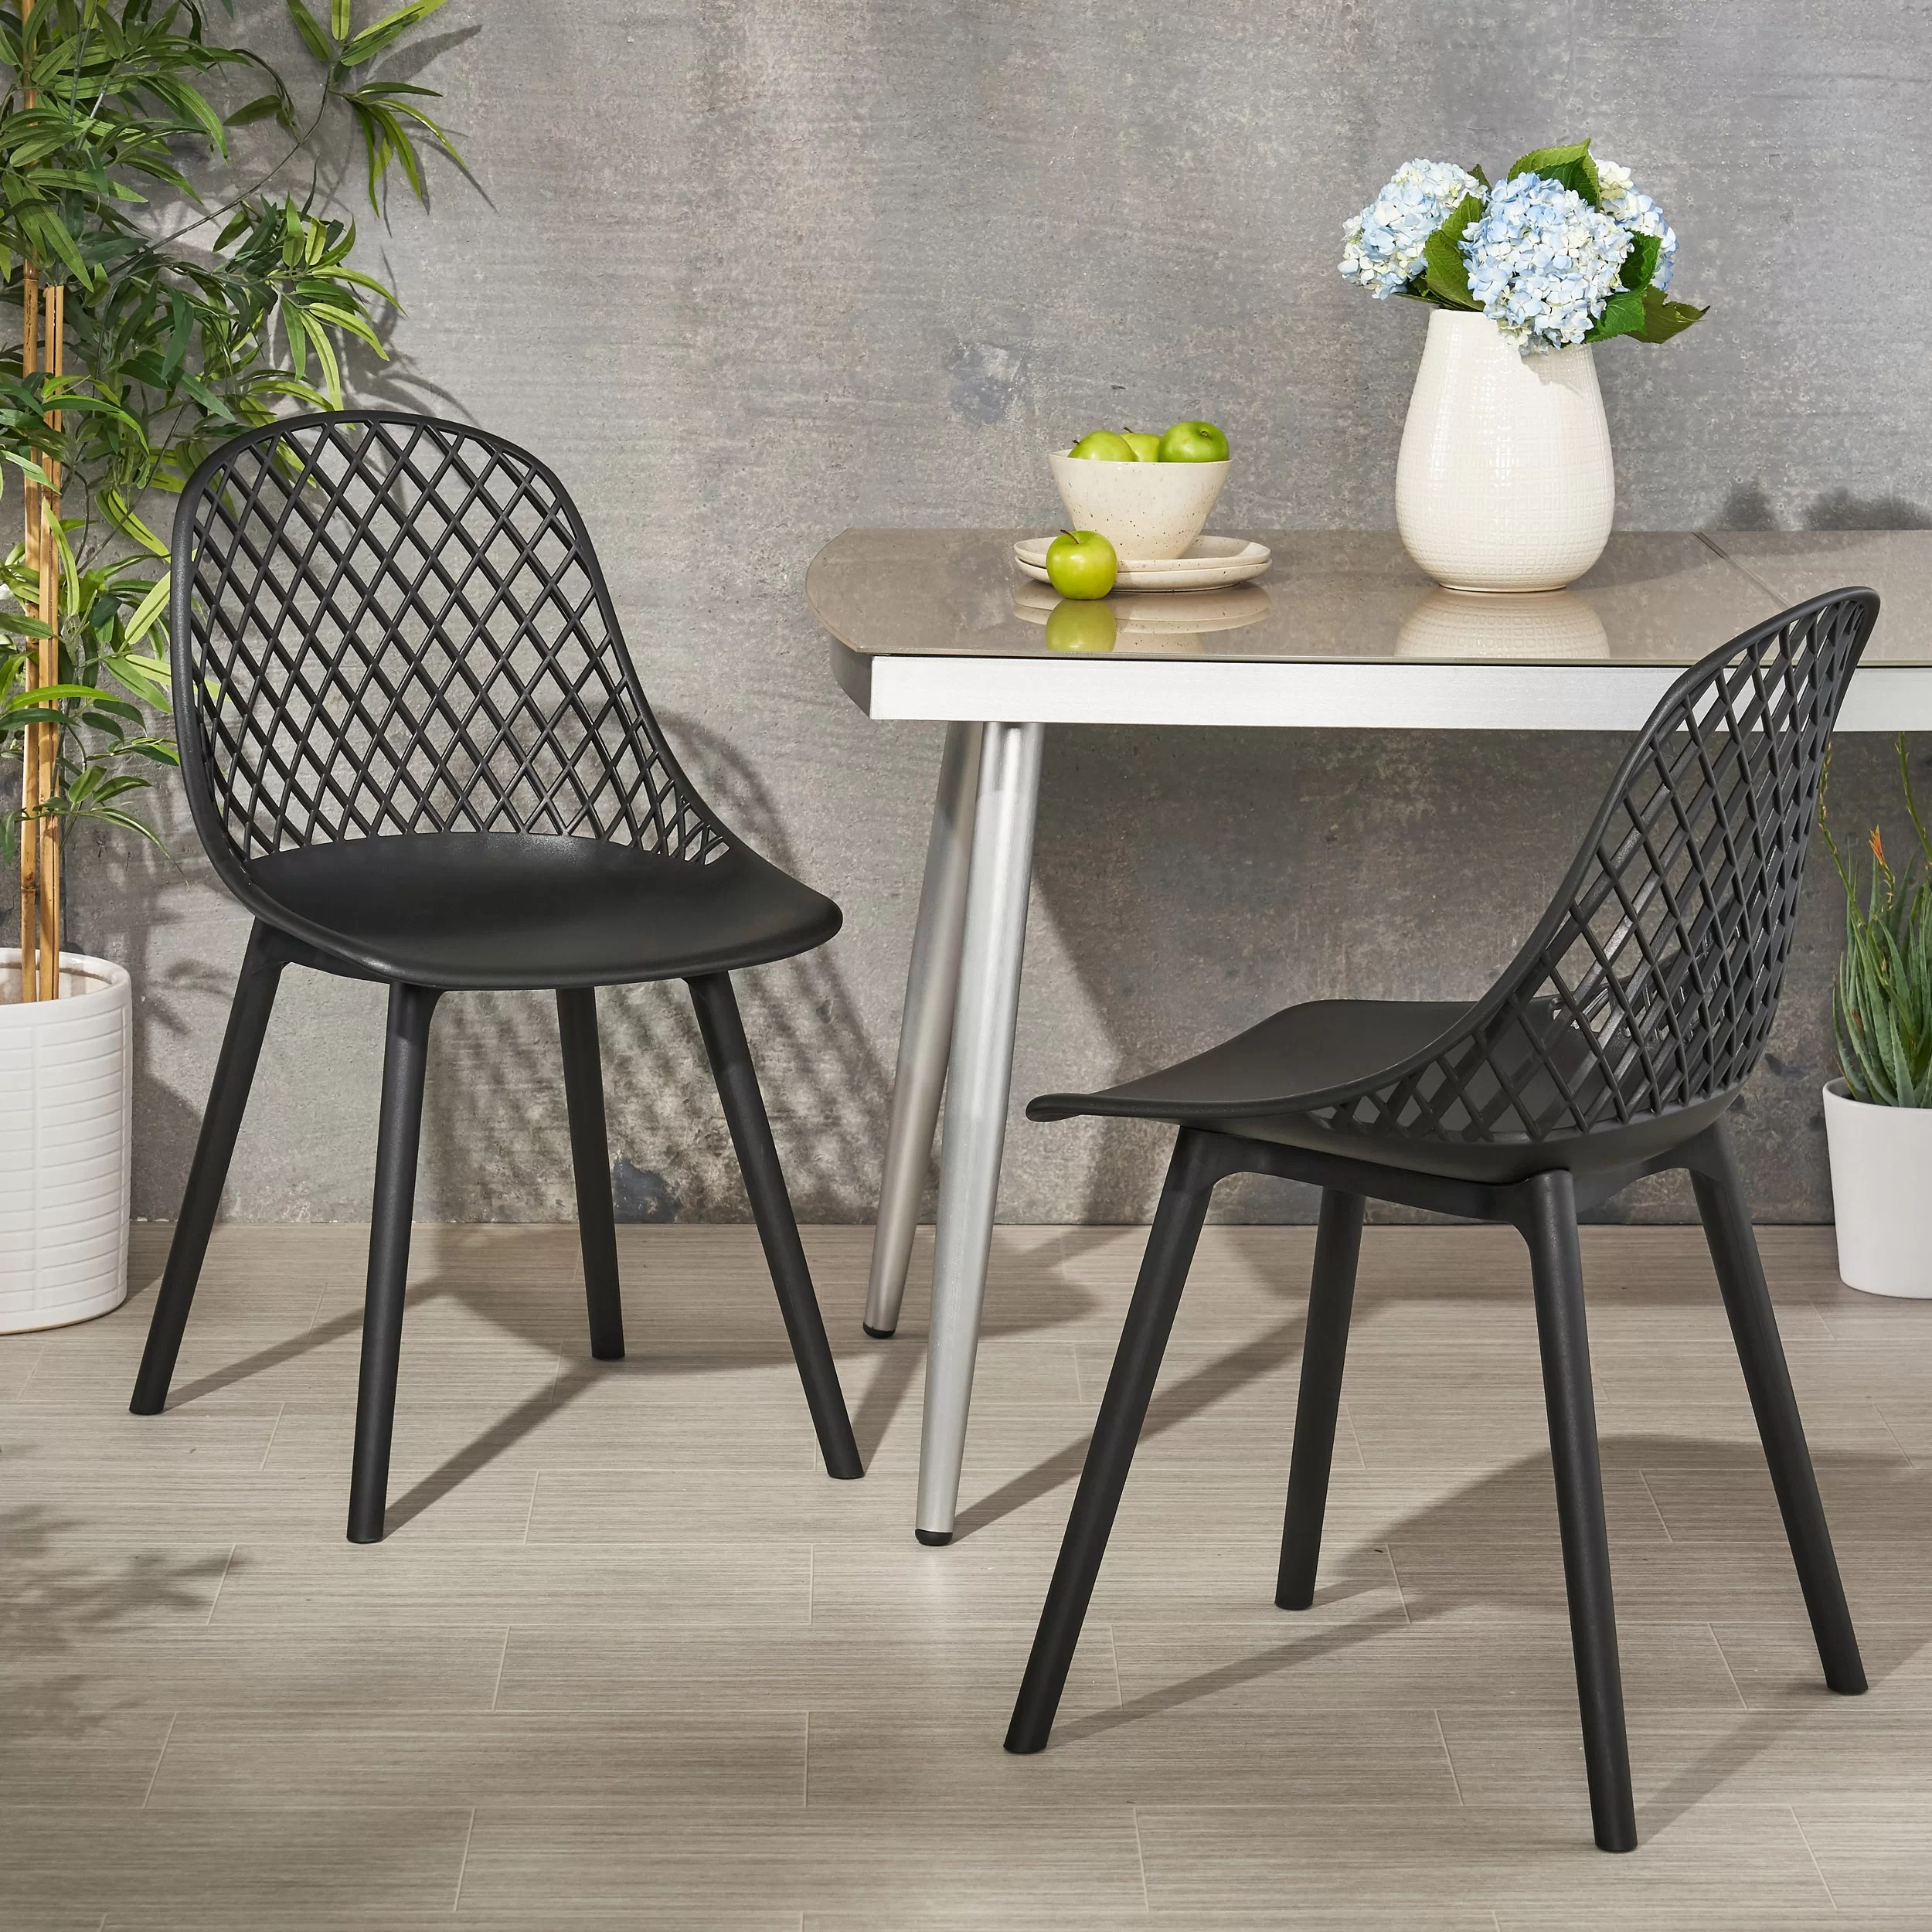 kenyon outdoor patio dining chair